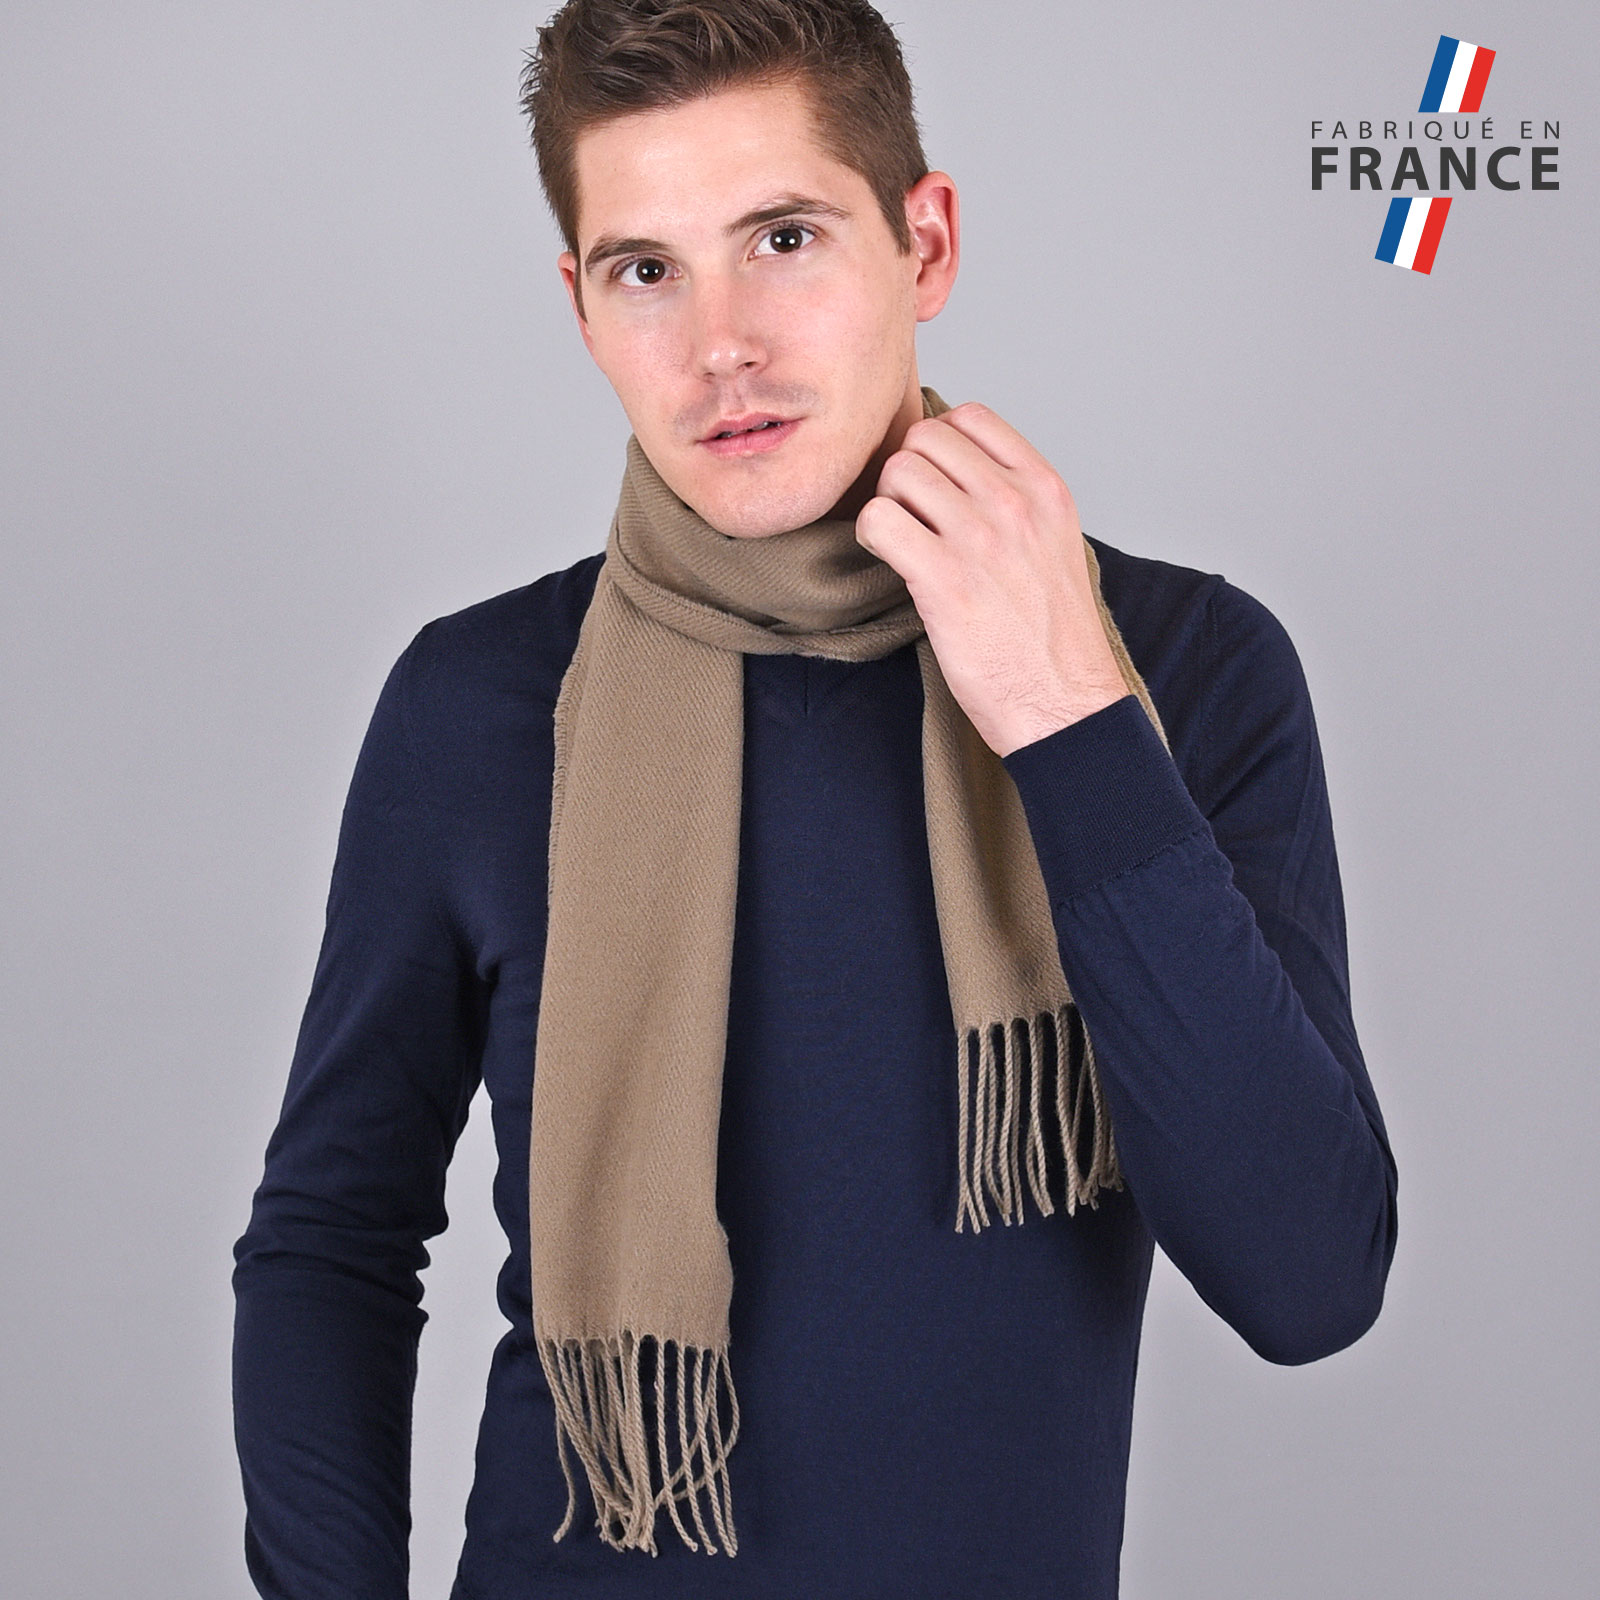 AT-03246-VH16-LB_FR-echarpe-homme-a-franges-beige-fabrication-francaise